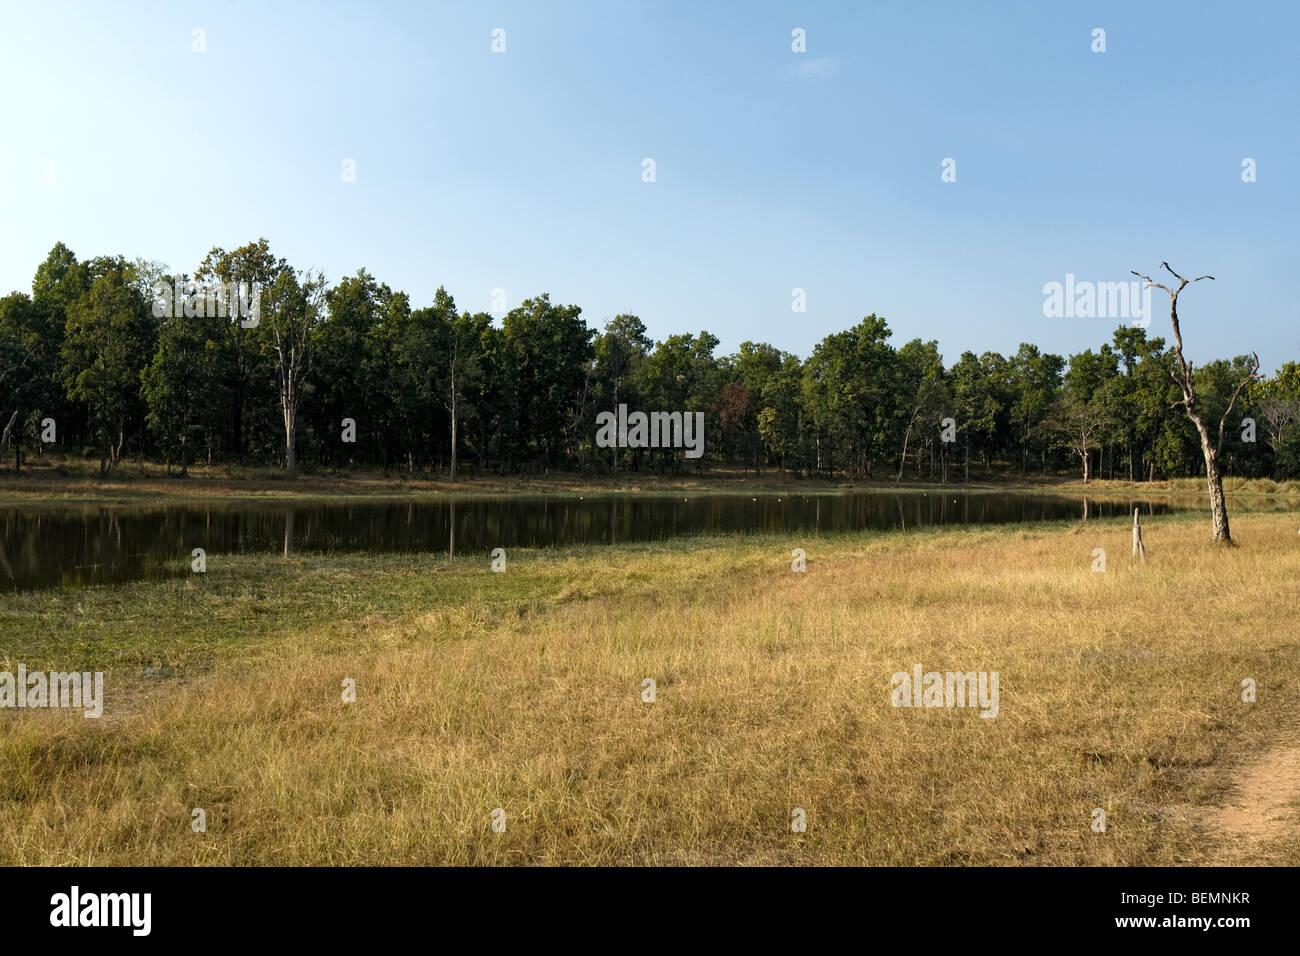 Bandhavgarh National Park India a - Stock Image